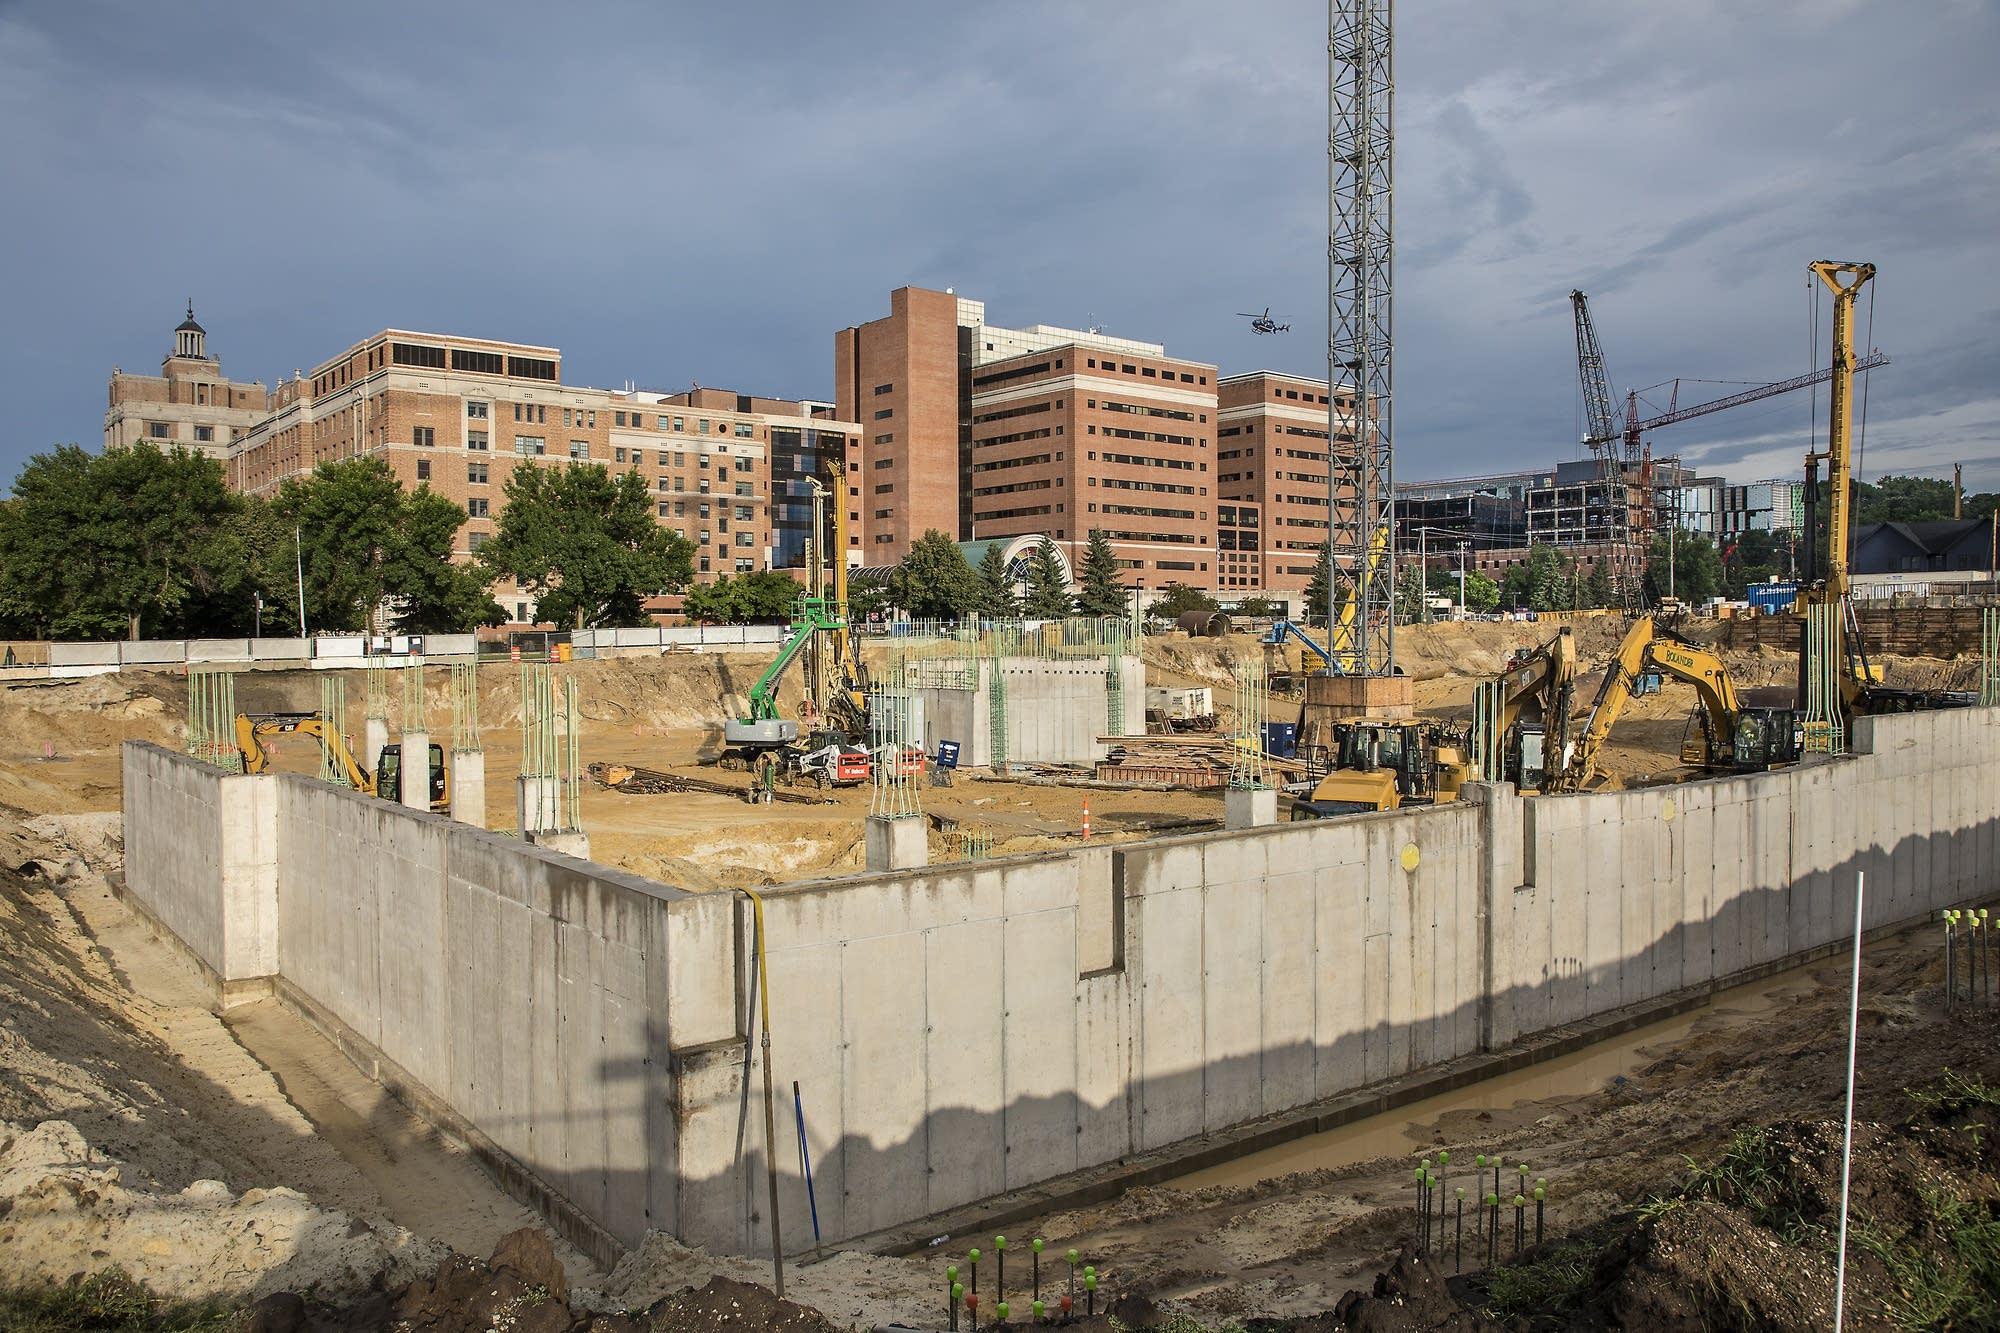 Rochester development hits its stride mpr news the berkman is a development across from saint marys hospital malvernweather Images